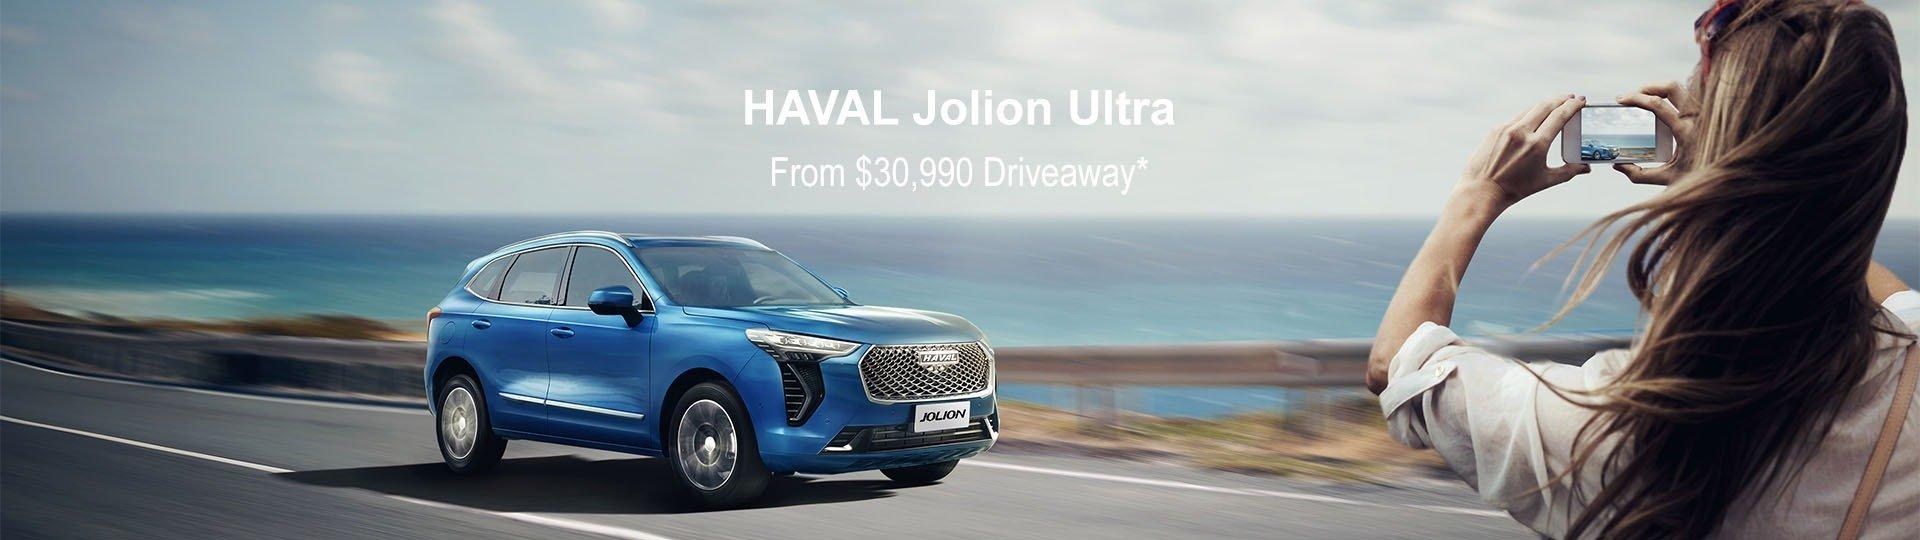 HAVAL Jolion Ultra